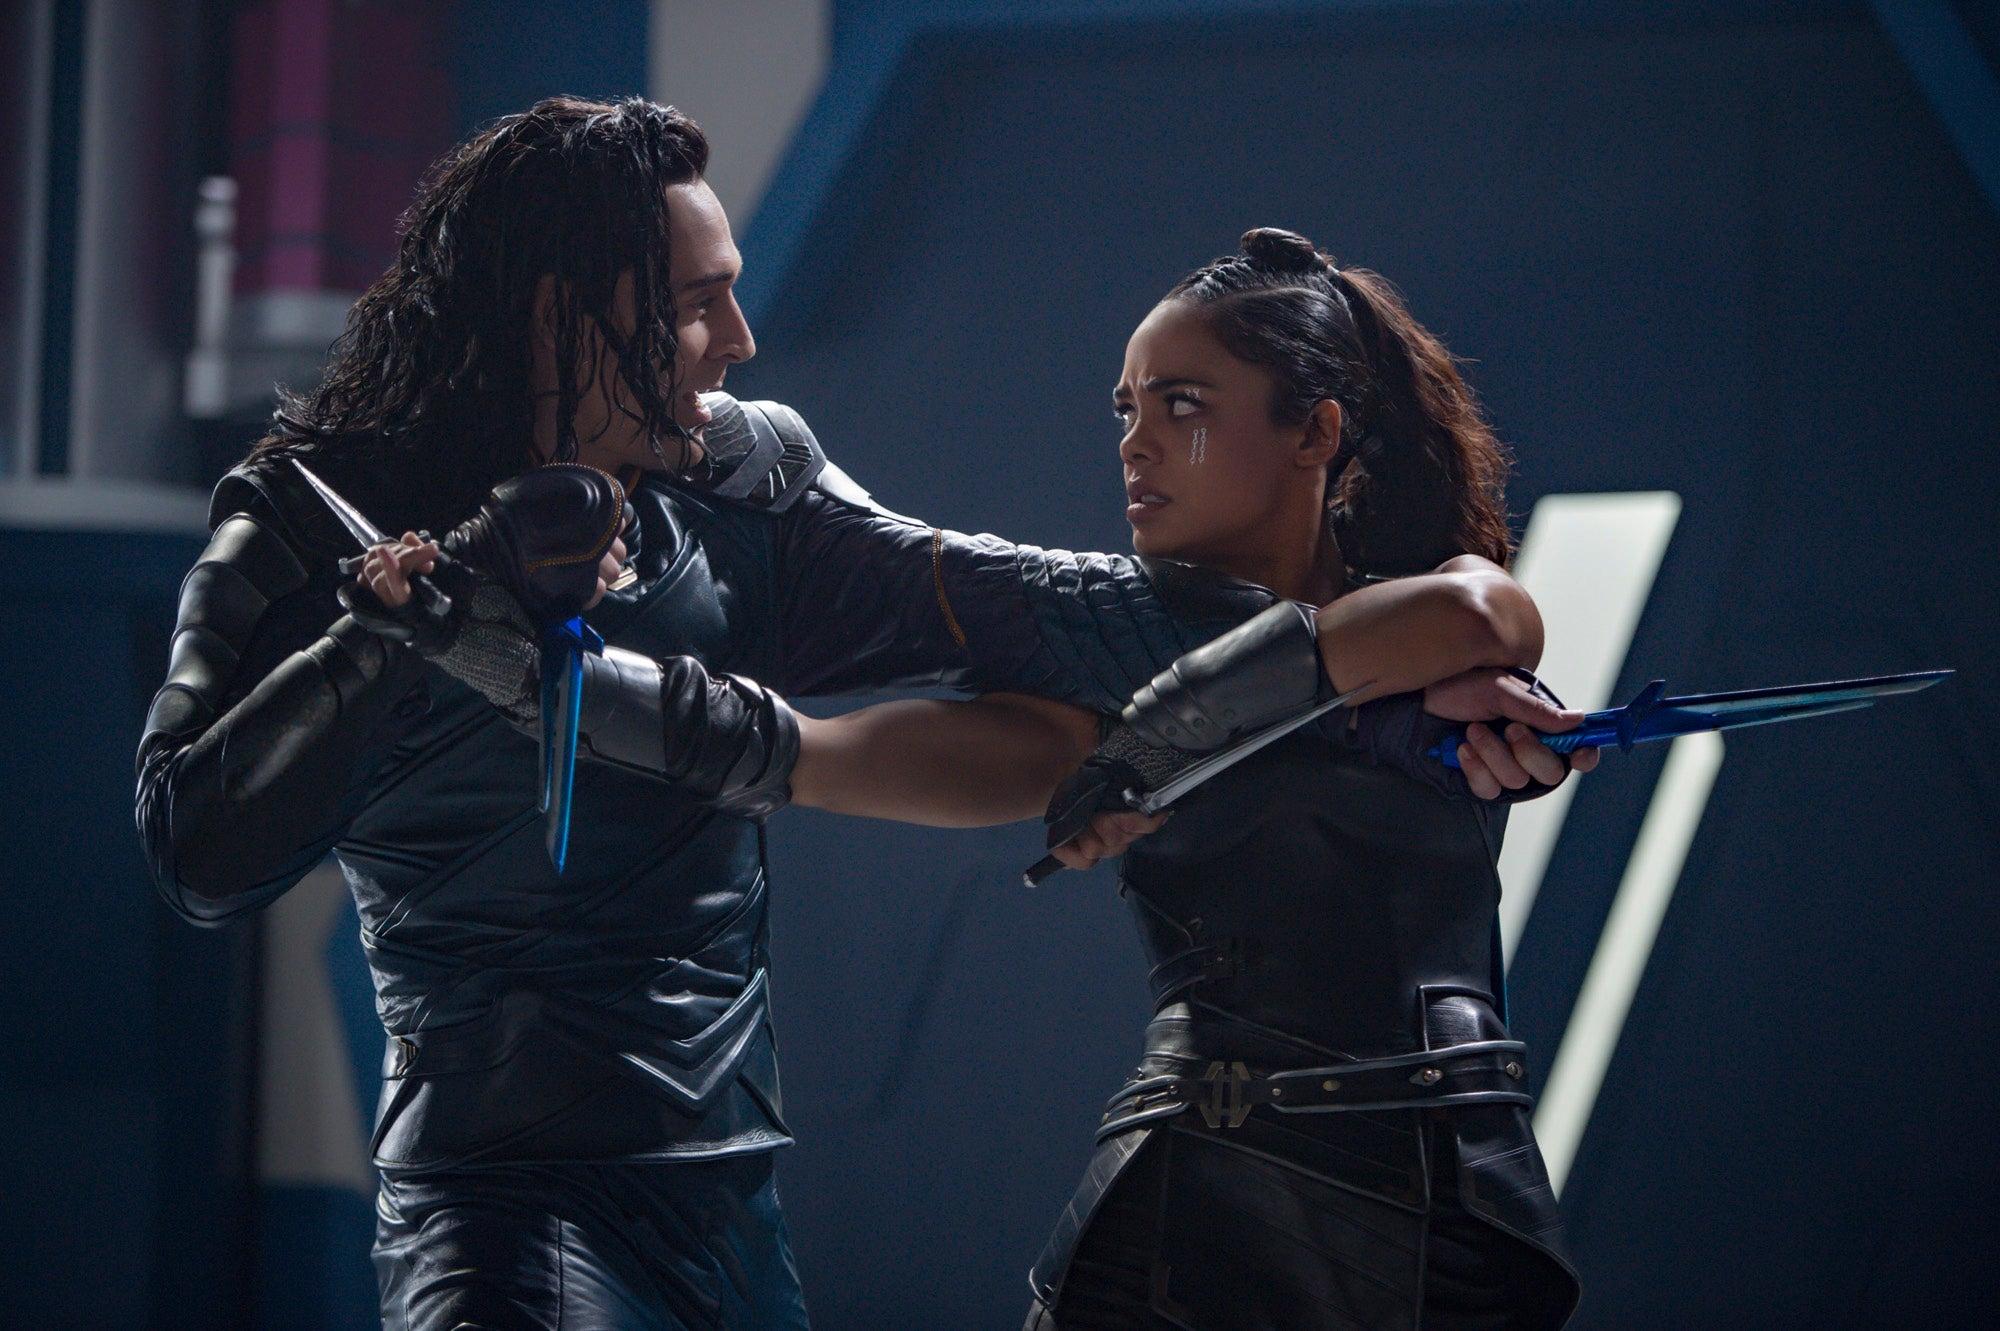 Tom Hiddleston, Tessa Thompson in Thor: Ragnarok